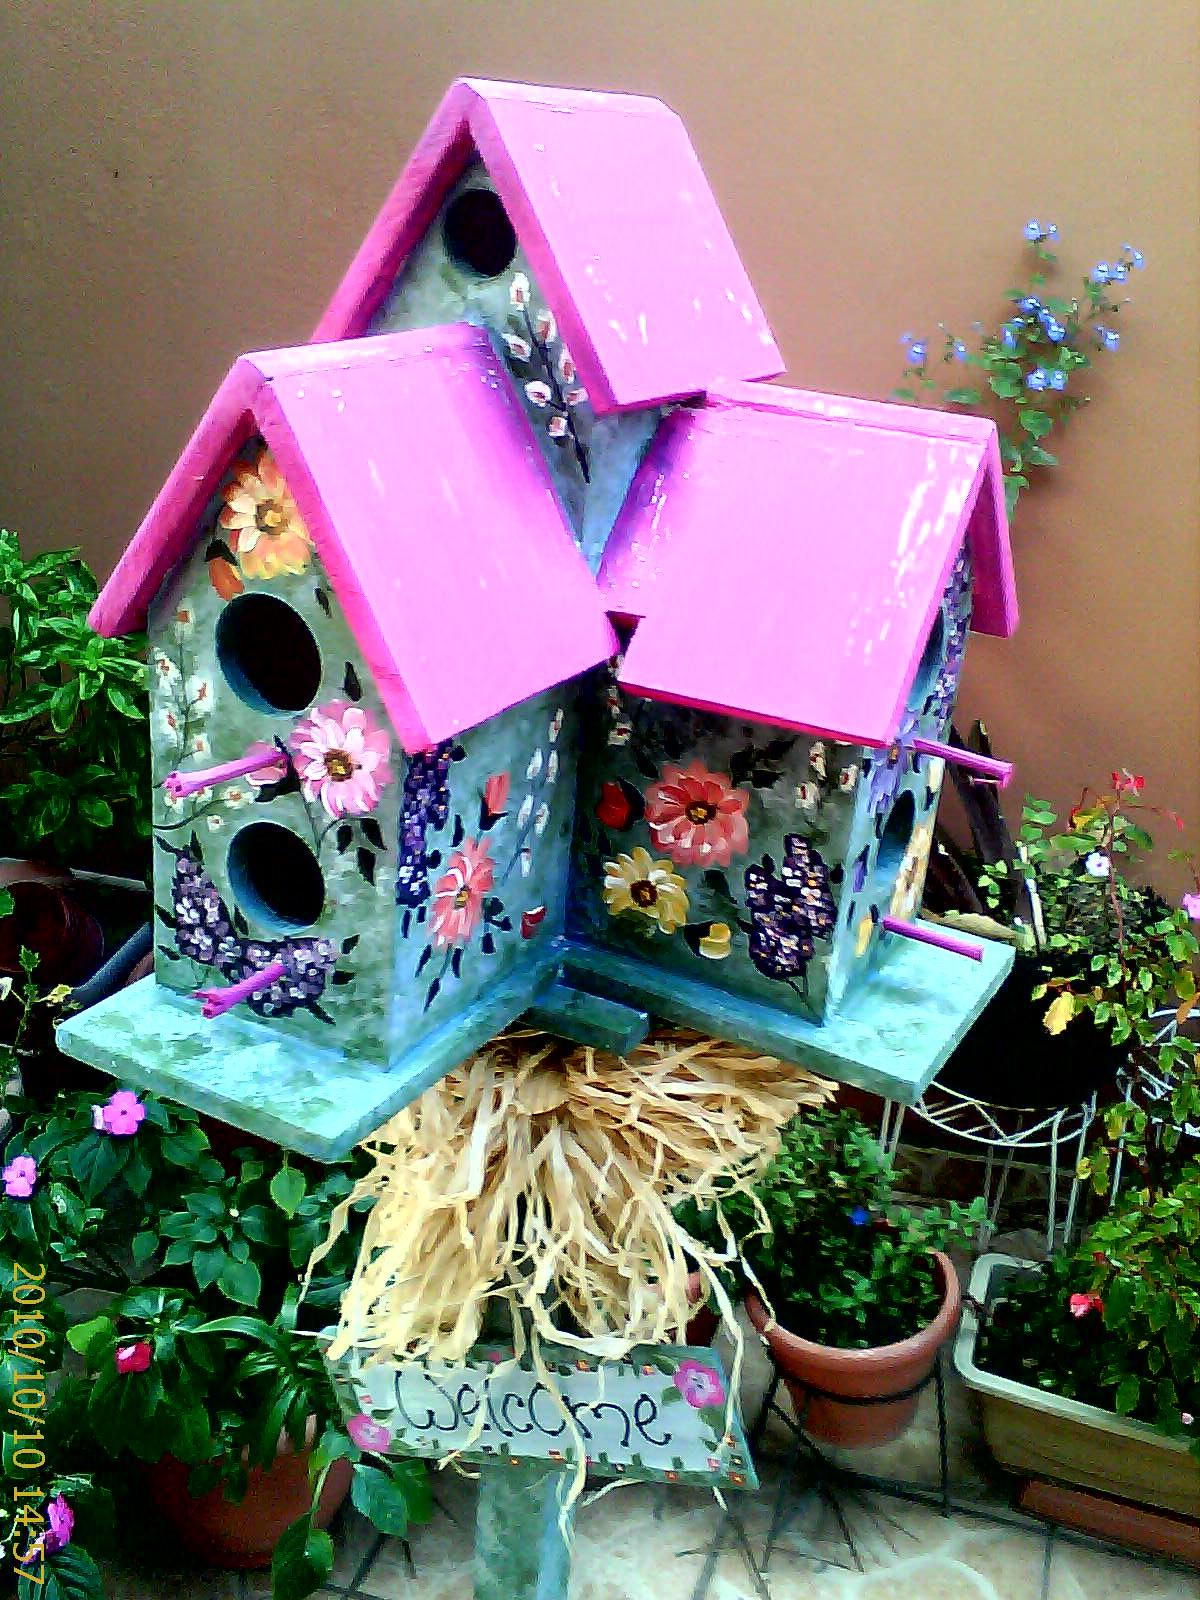 Country houses pajareras y muebles pintados a mano for Muebles pintados a mano